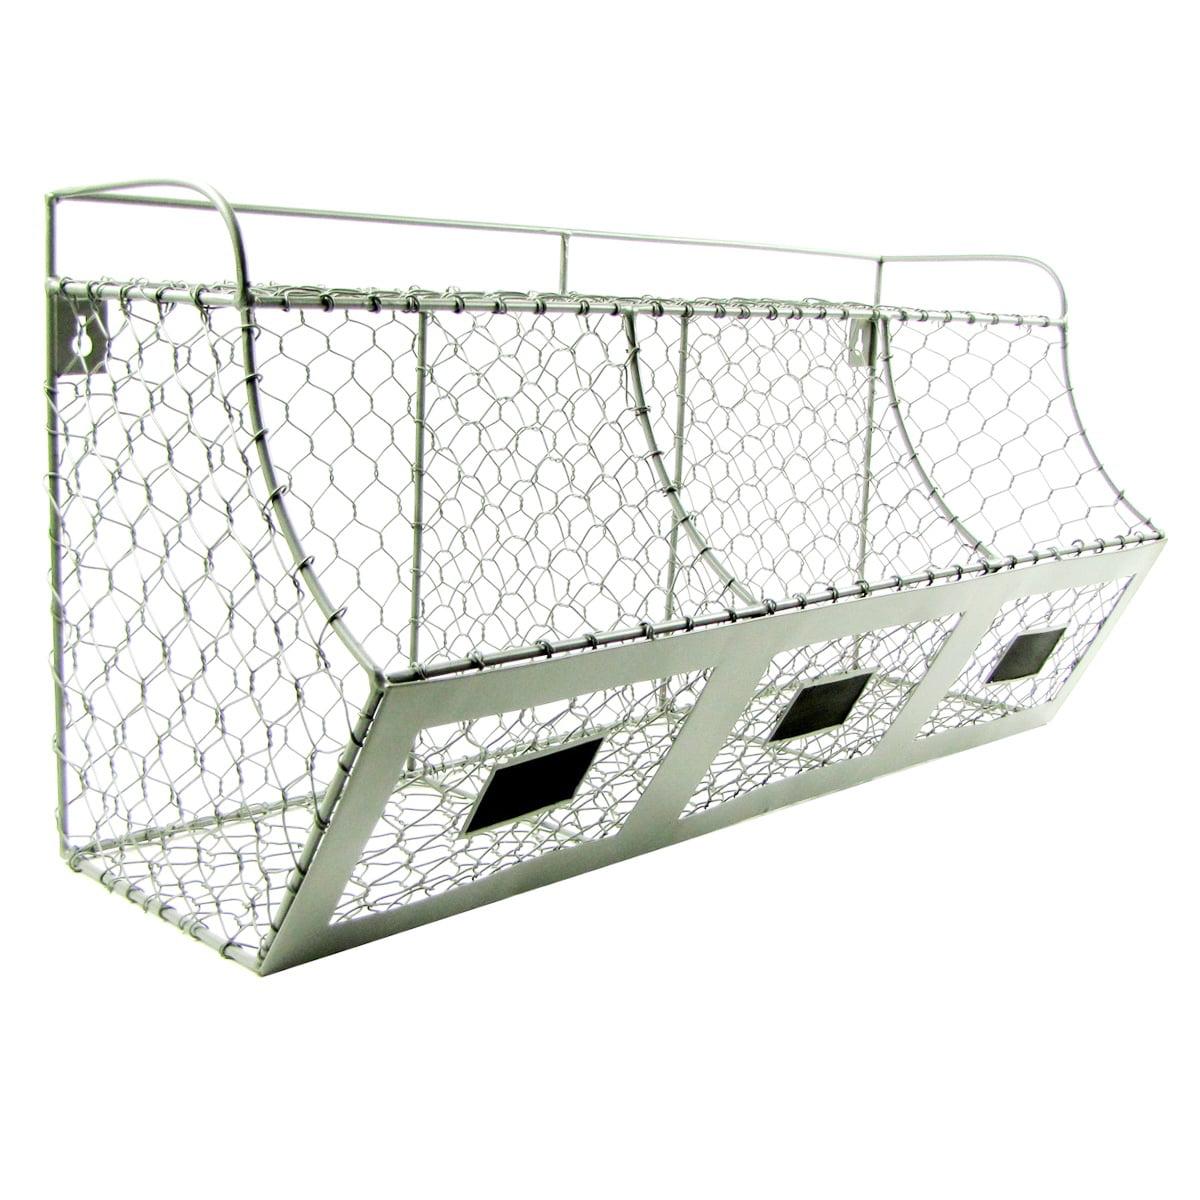 Treasure Gurus Rustic Chicken Wire Wall Storage 3 Bin Basket Primitive  Country Farmhouse Decor   Walmart.com